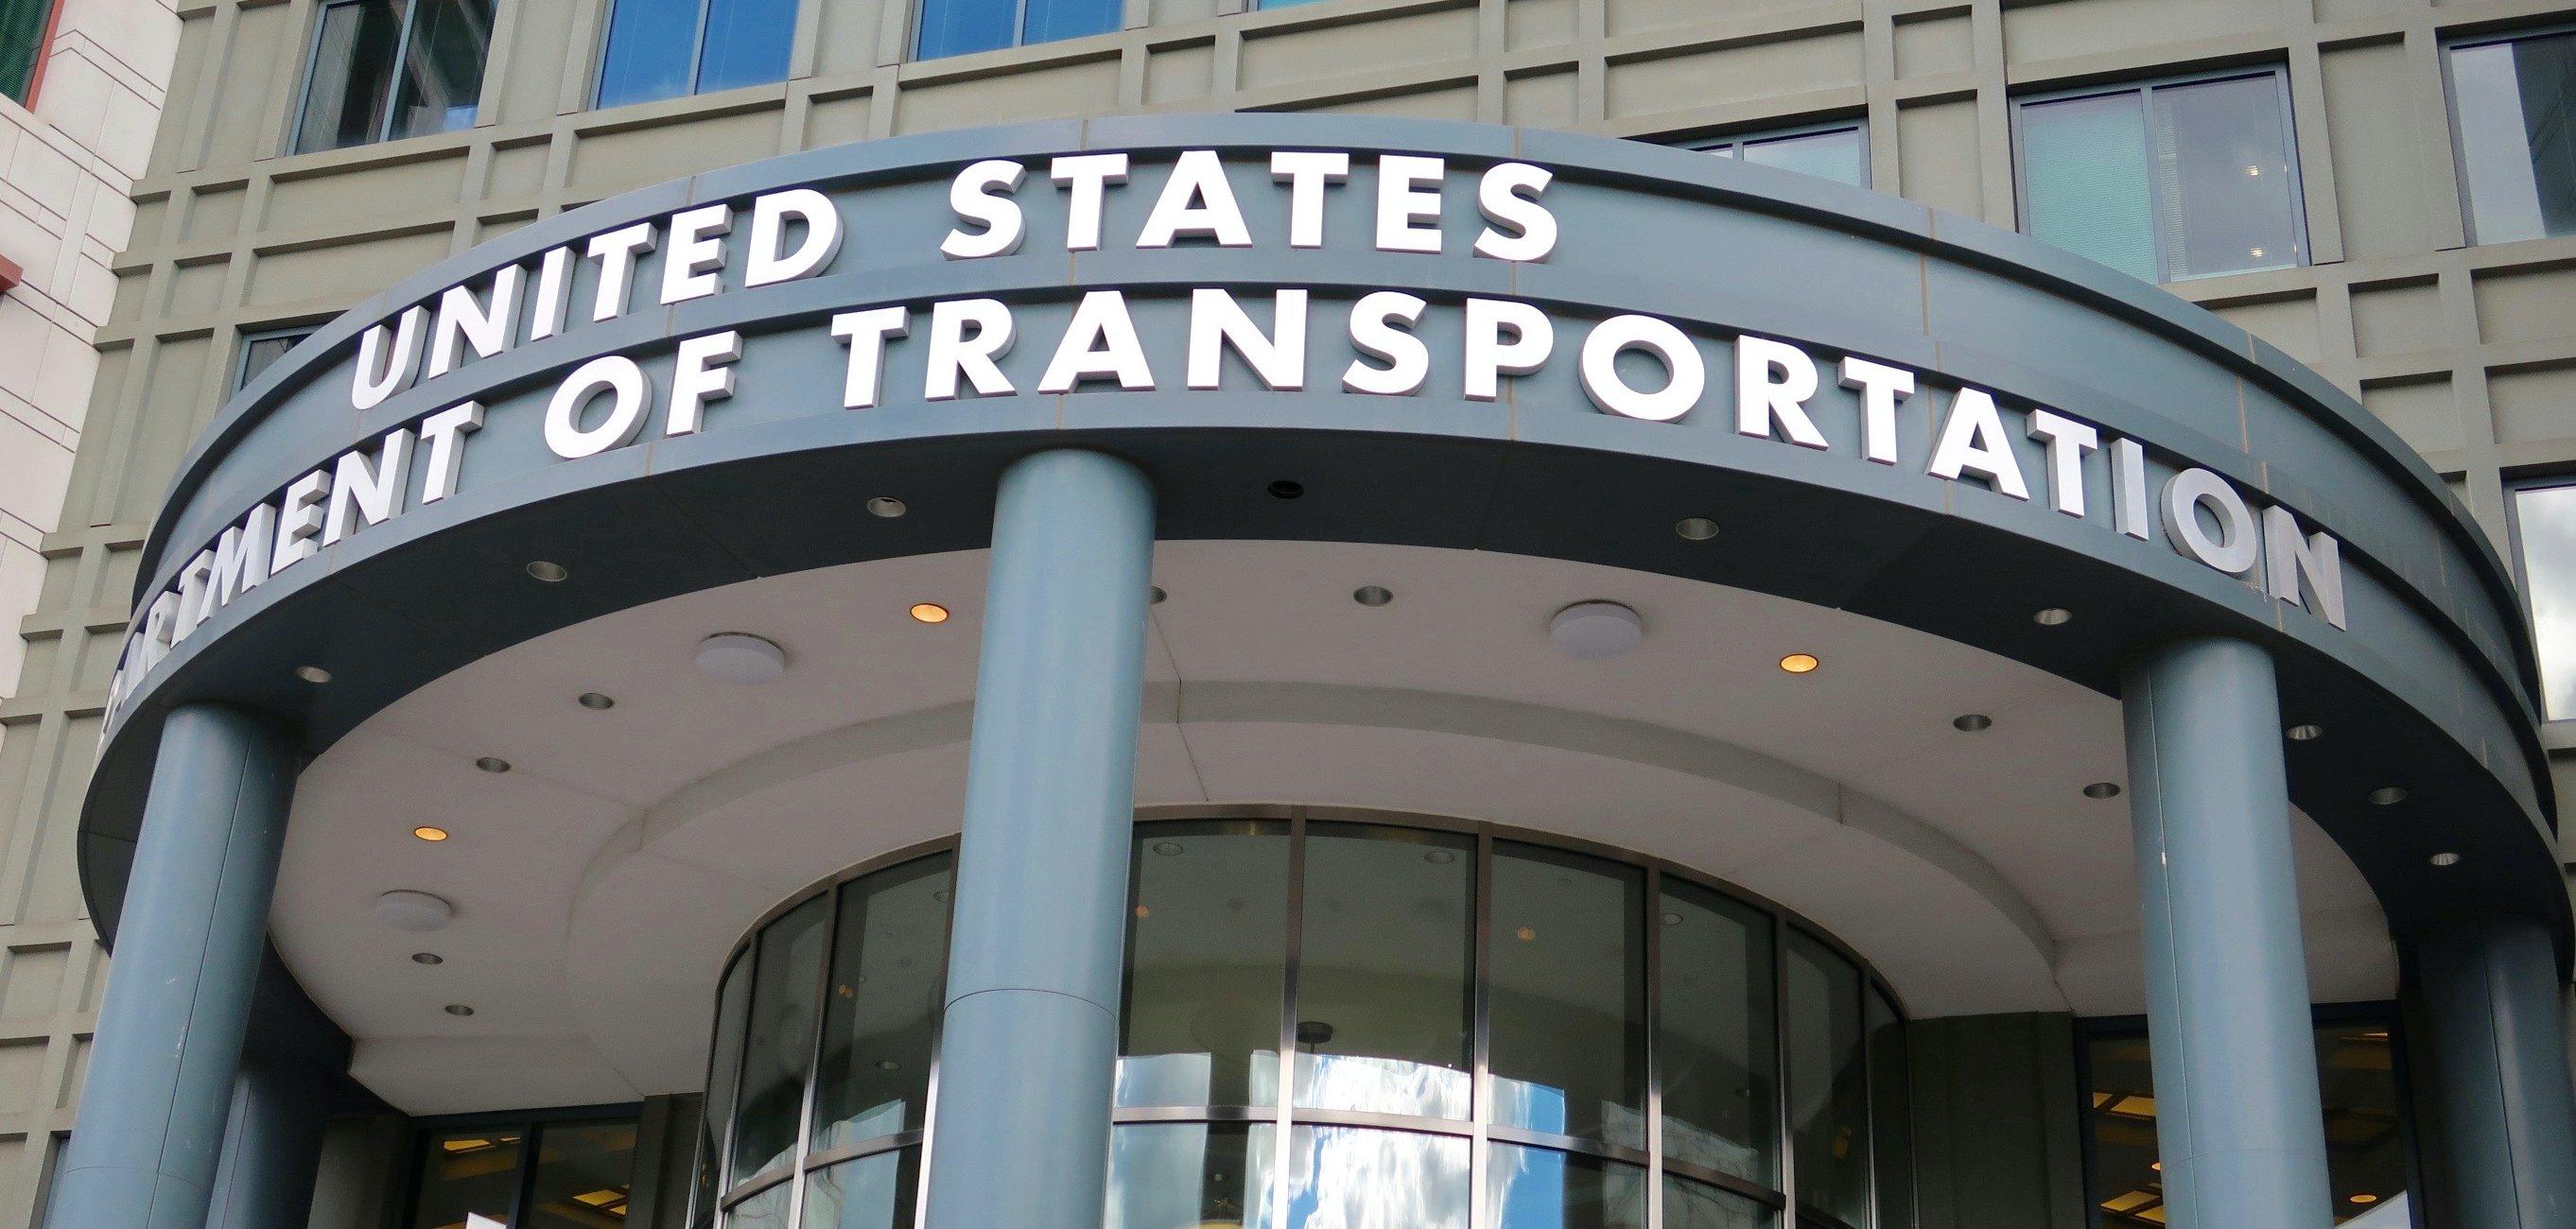 US Dept of Transportation Main Office Front